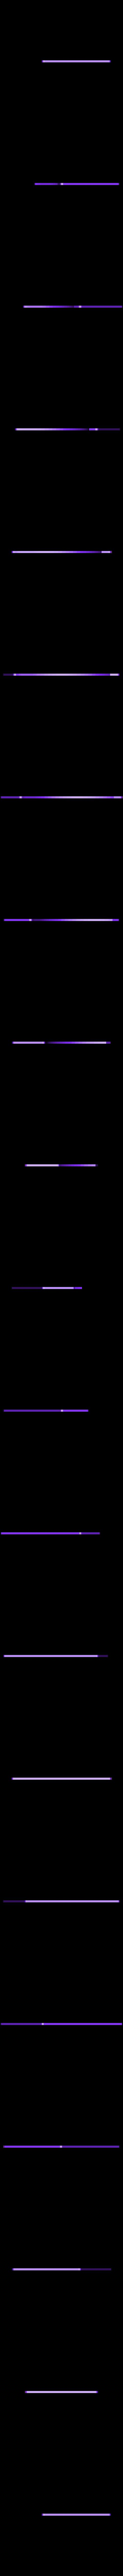 ant patch1 (1 pcs).STL Download STL file Folding Quadcopter 450 Frame • 3D print object, AleksandrDolzhenko